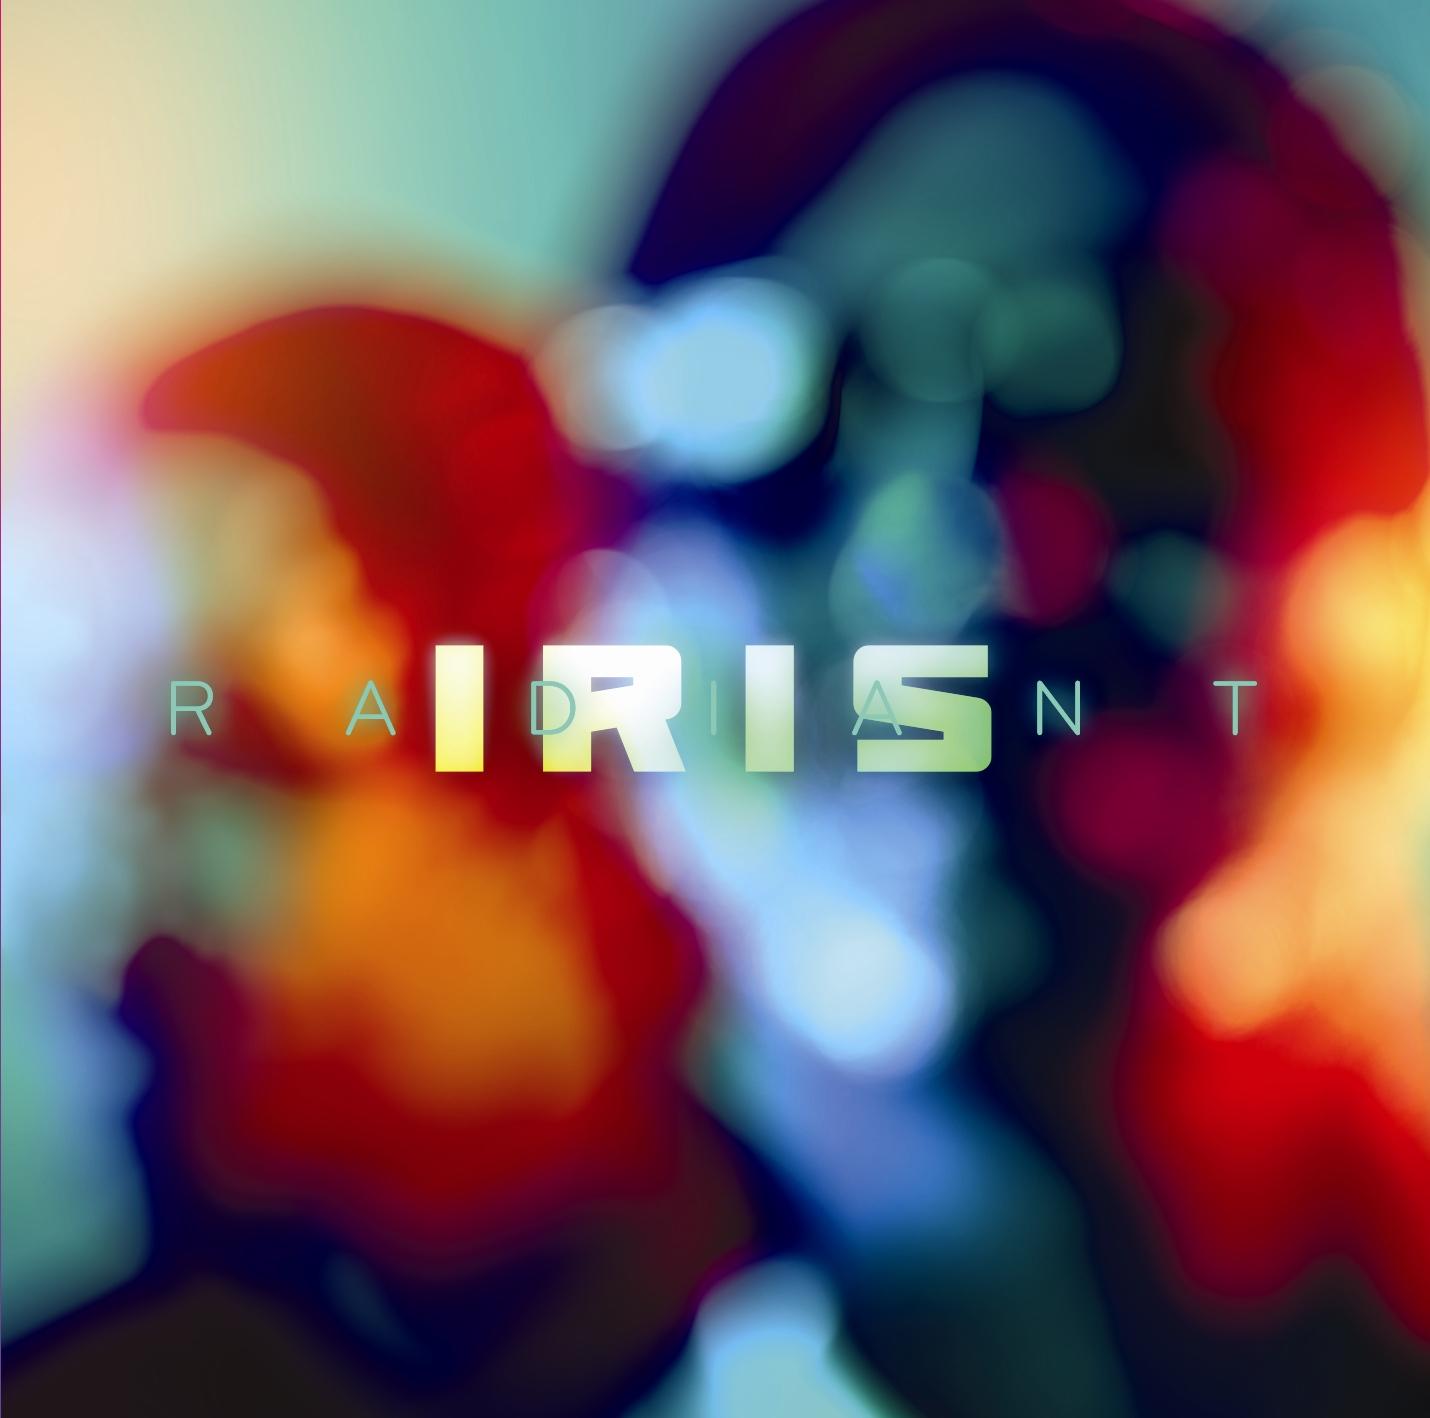 IRIS Radiant CD 2014